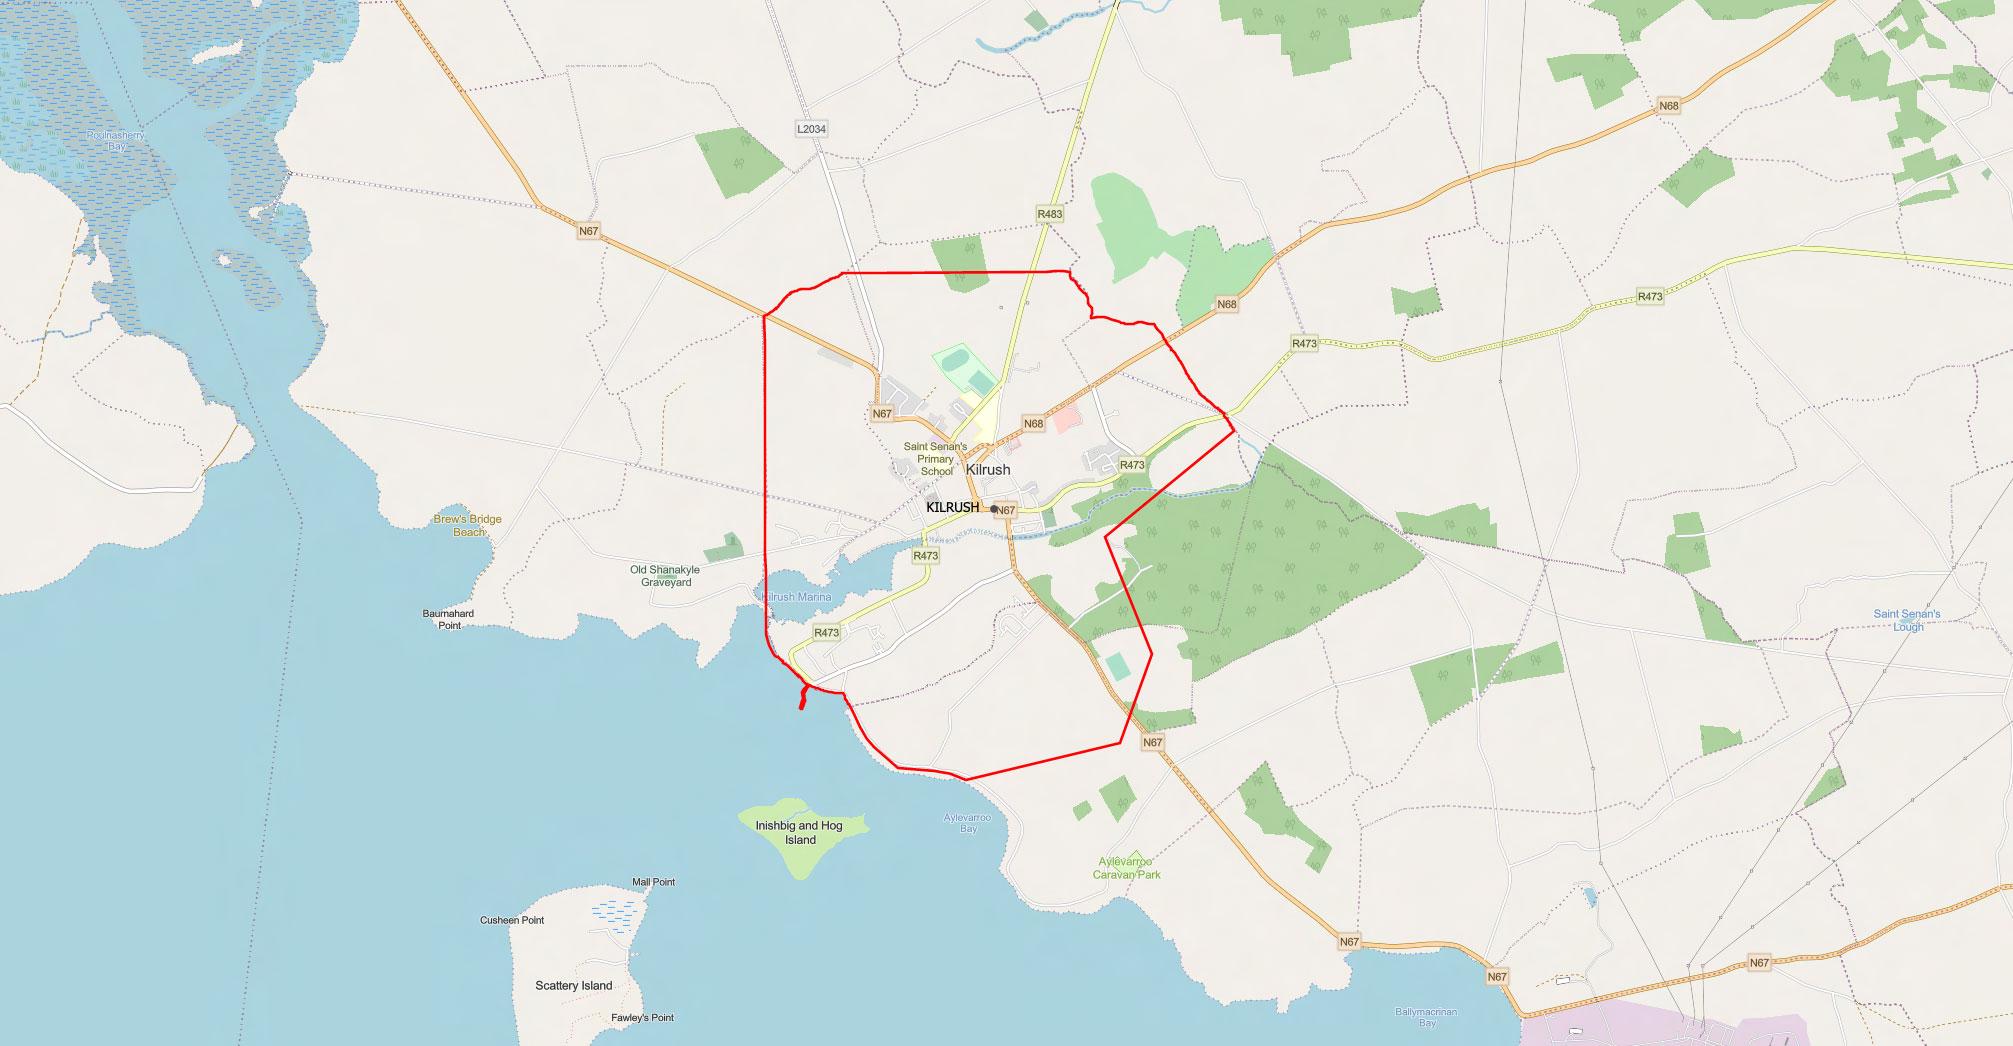 solar-panels-kilrush-clare-ireland-map-img